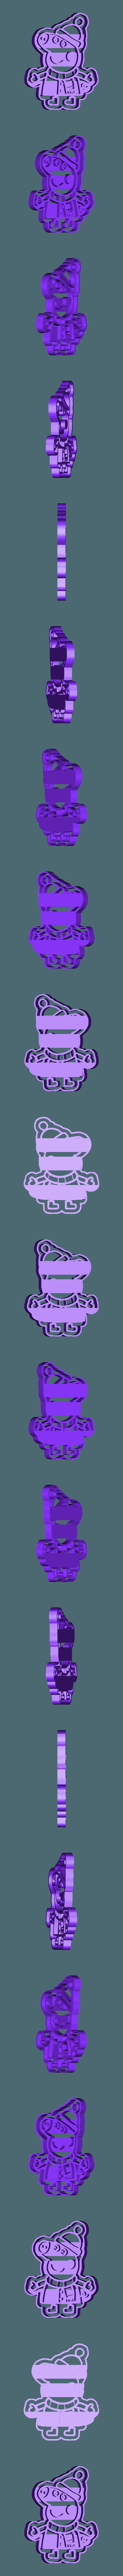 Peppa Snow.stl Download STL file cut peppa nieve • 3D print design, Blop3D